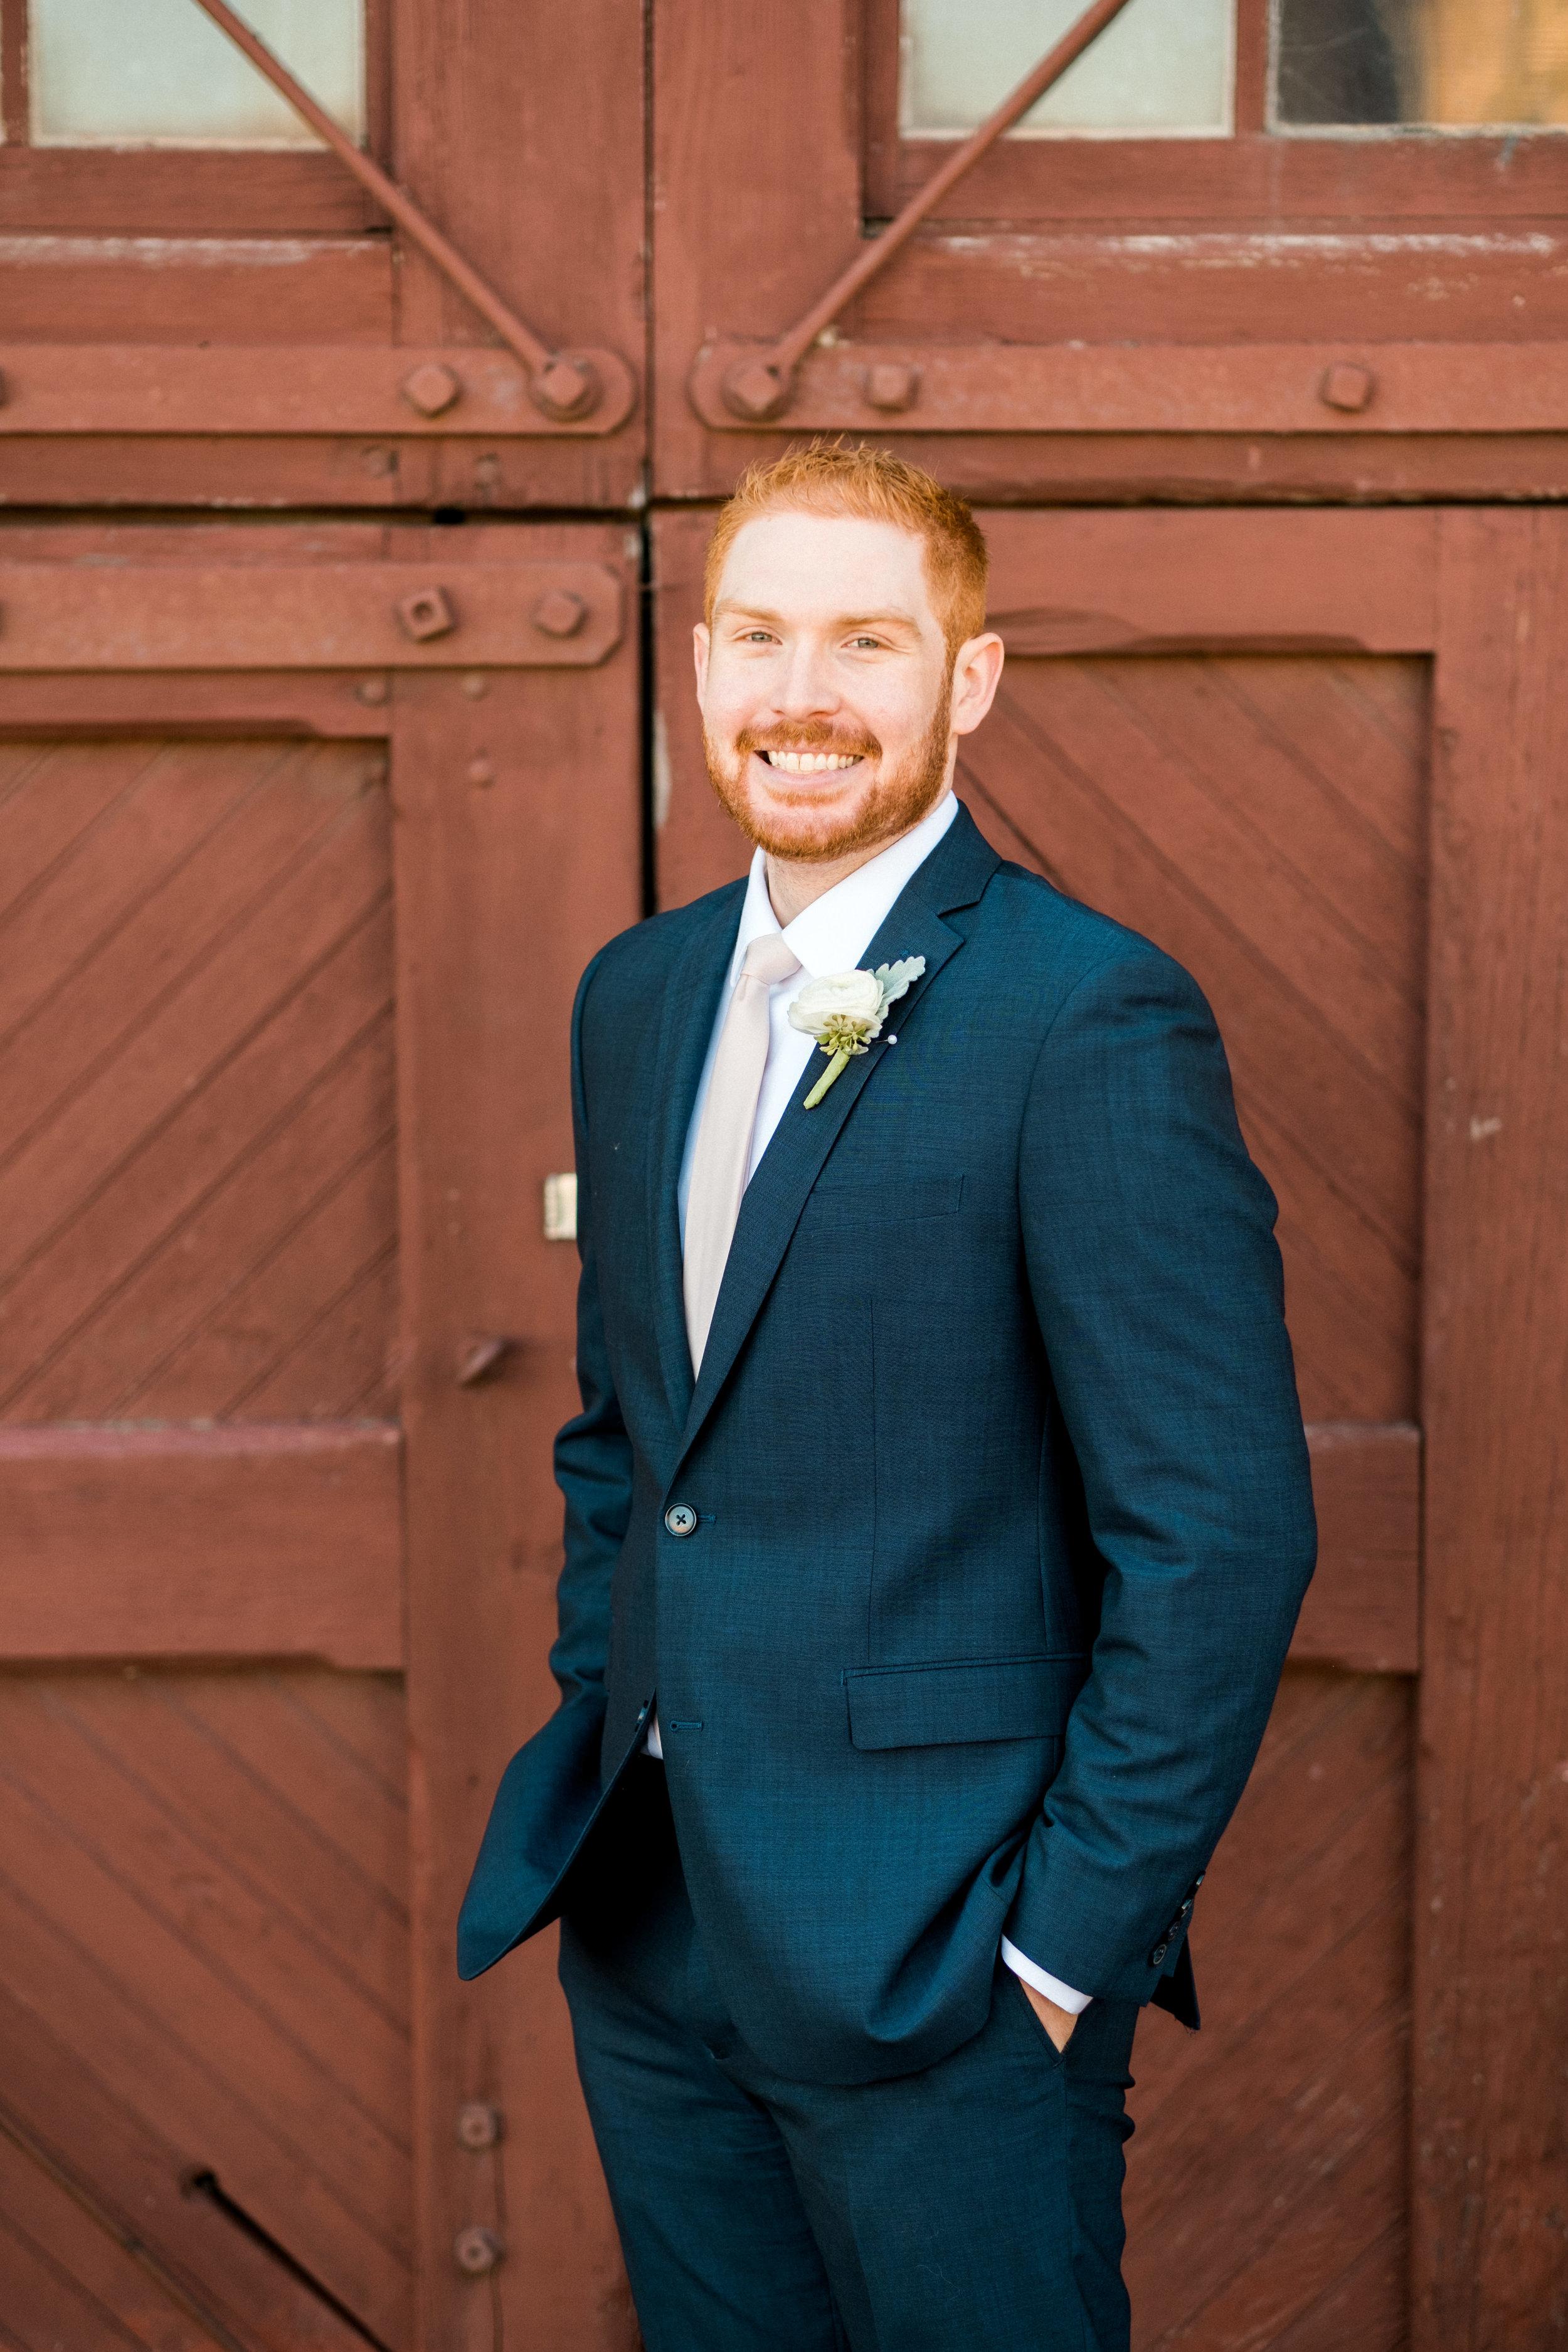 outdoor picture of groom the np space in brainerd